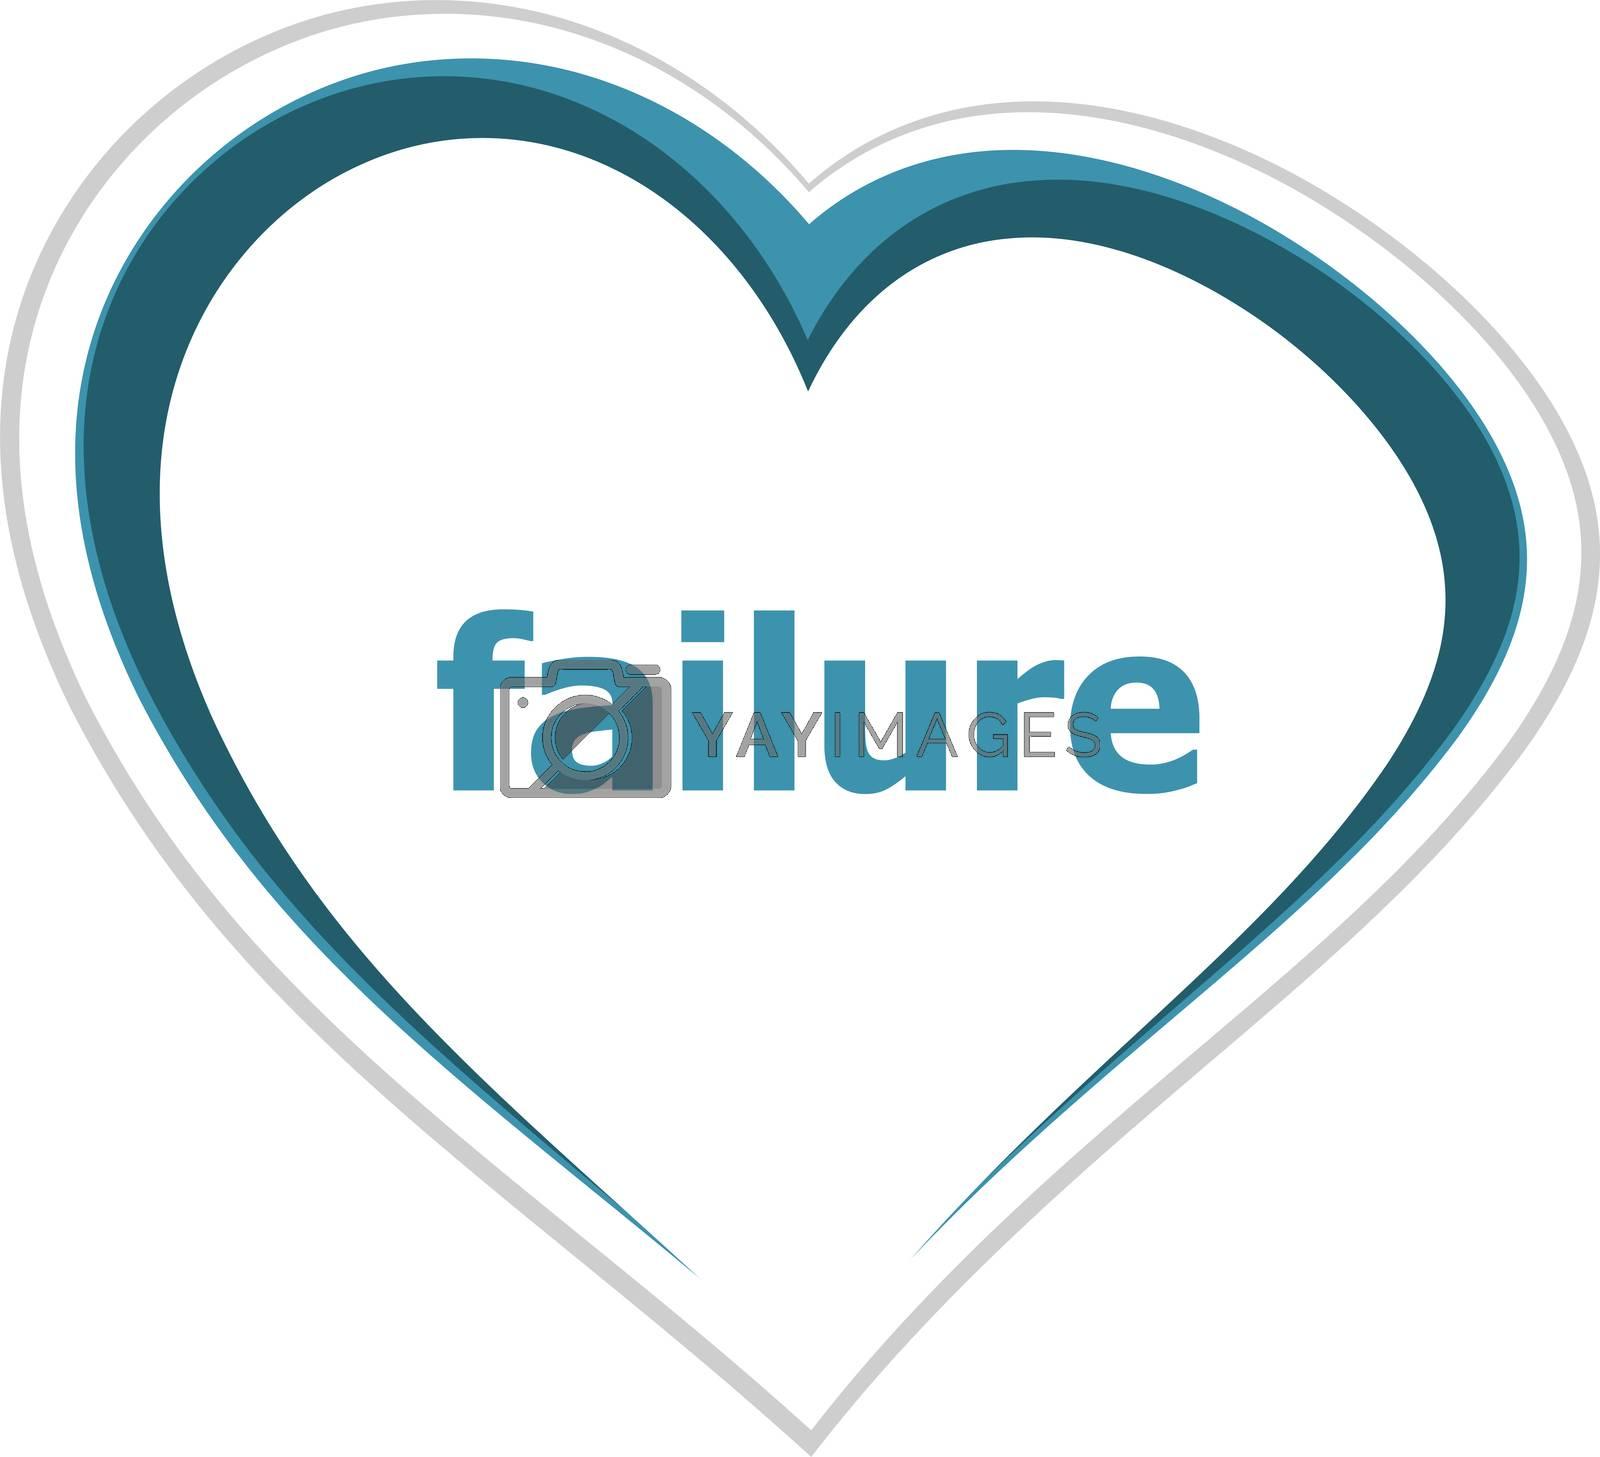 Text Failure. Finance concept